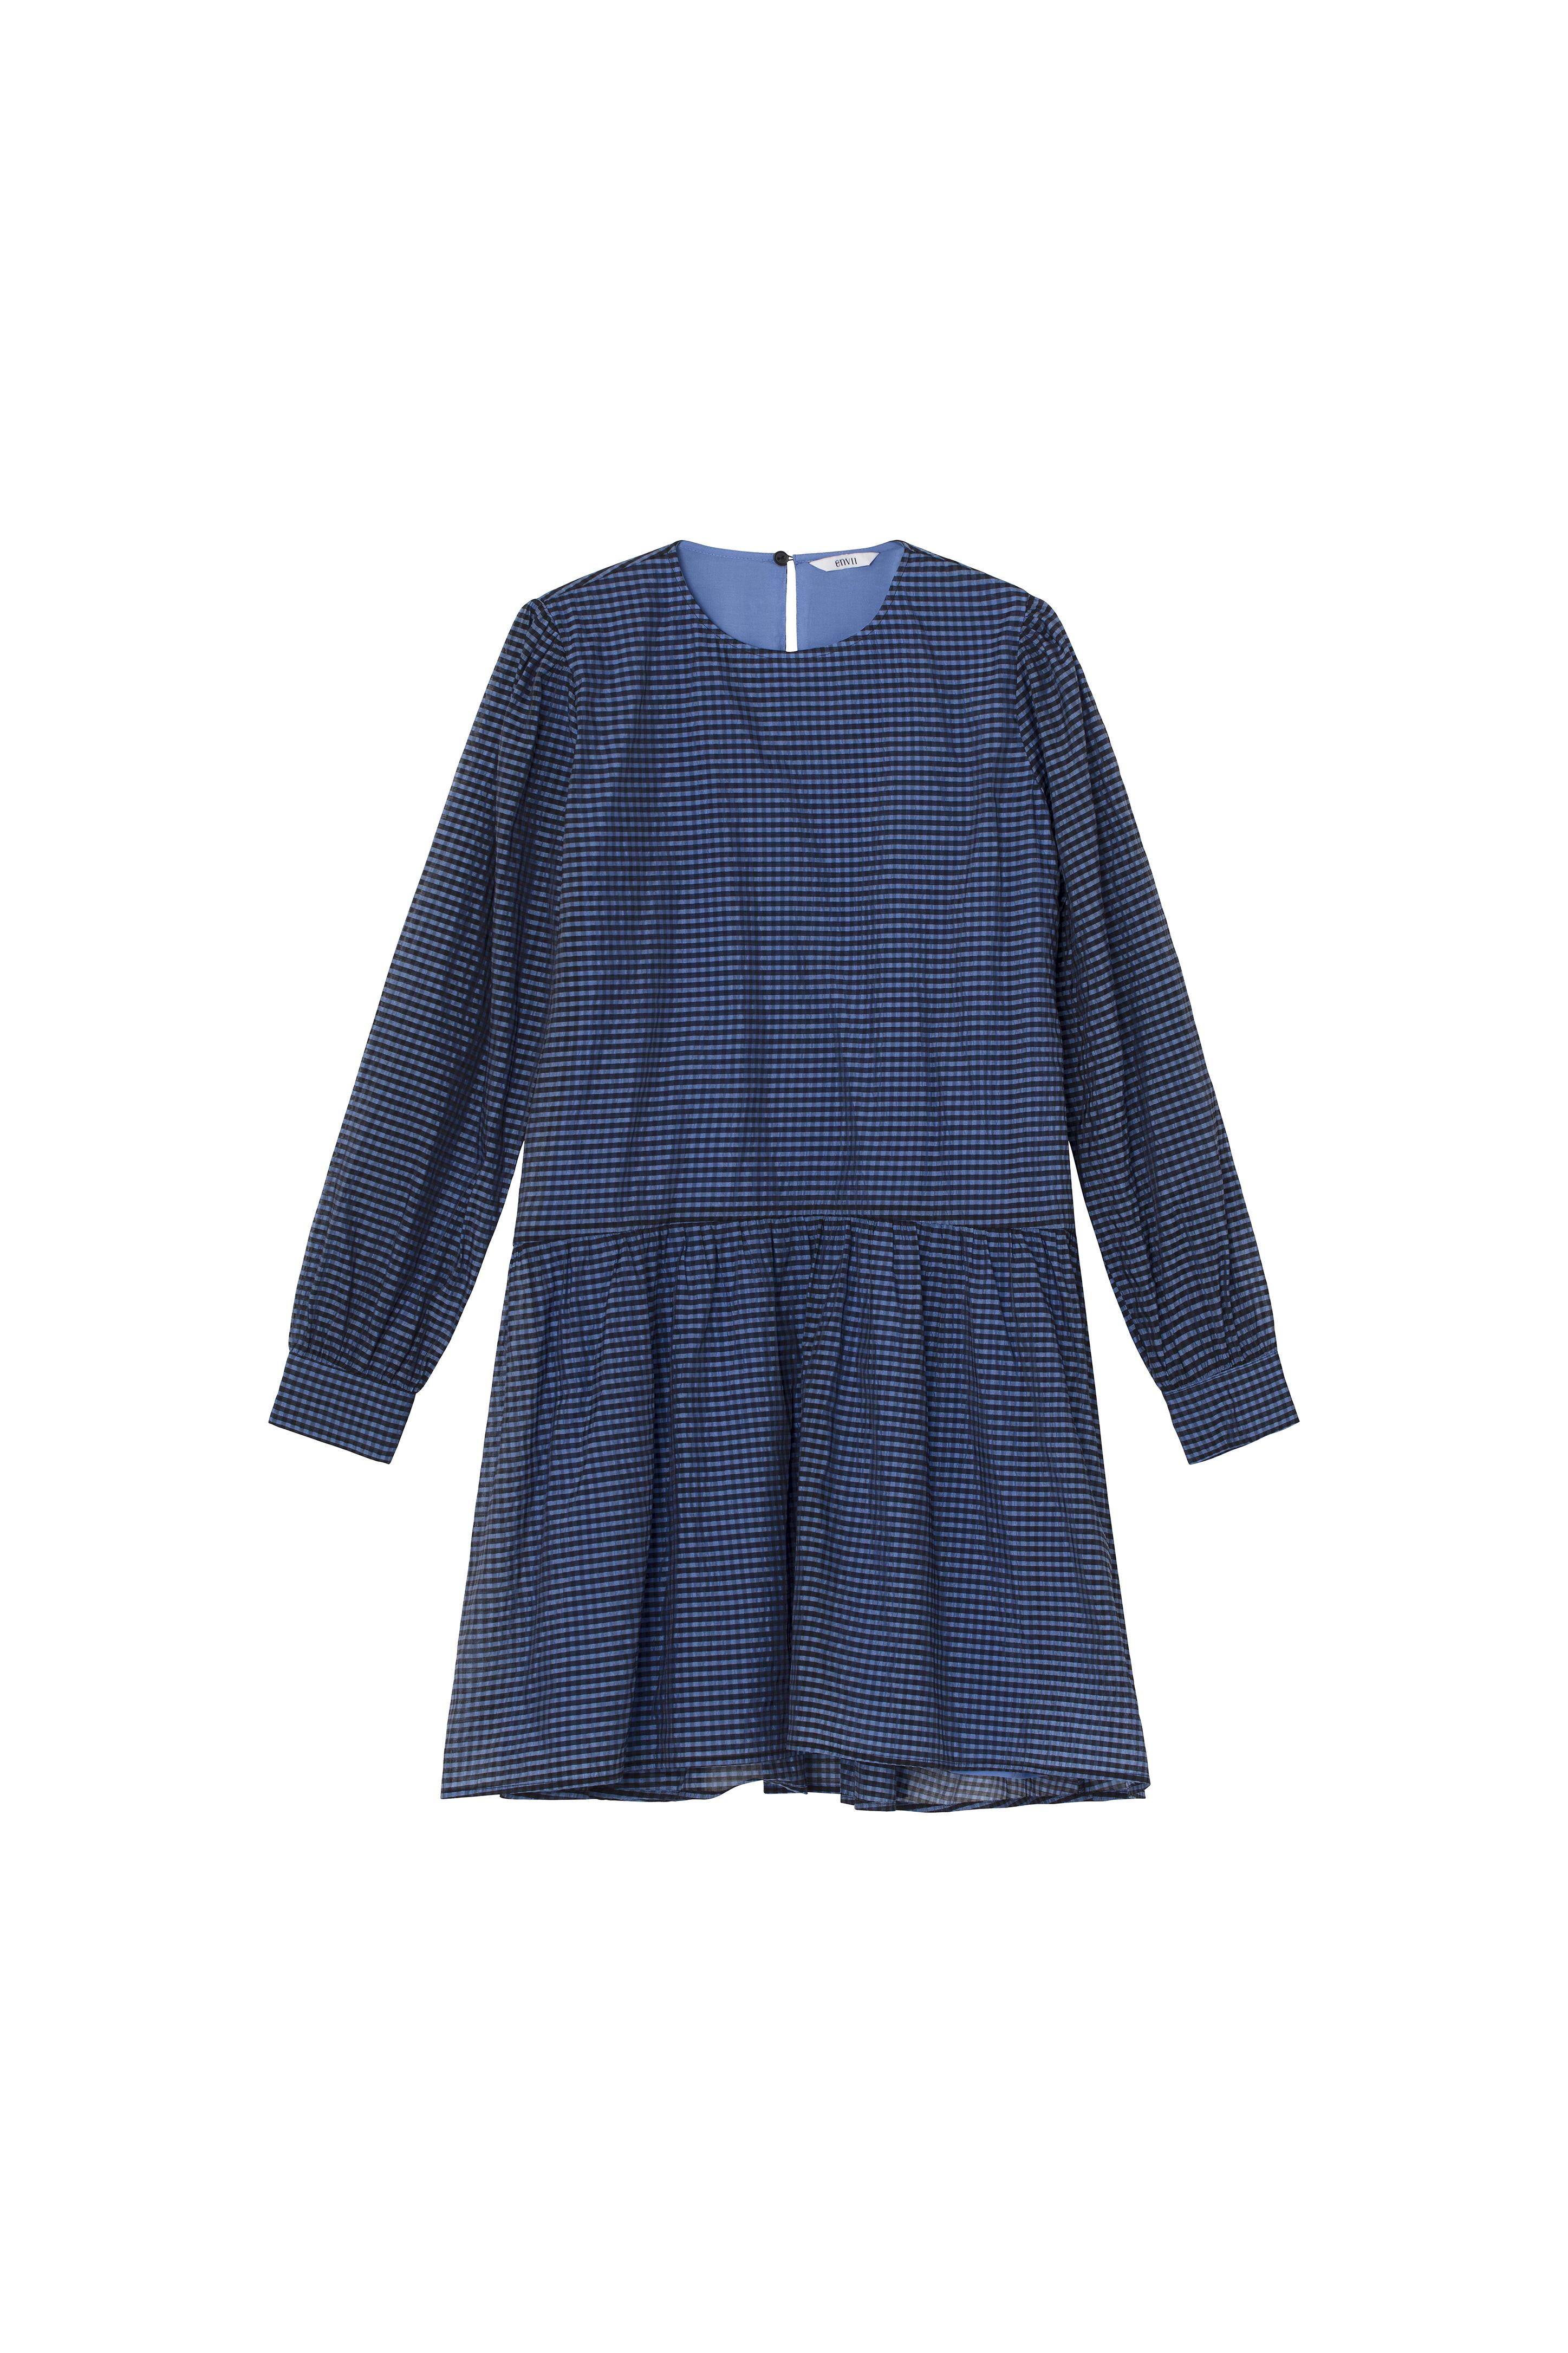 Envii Encolby kjole